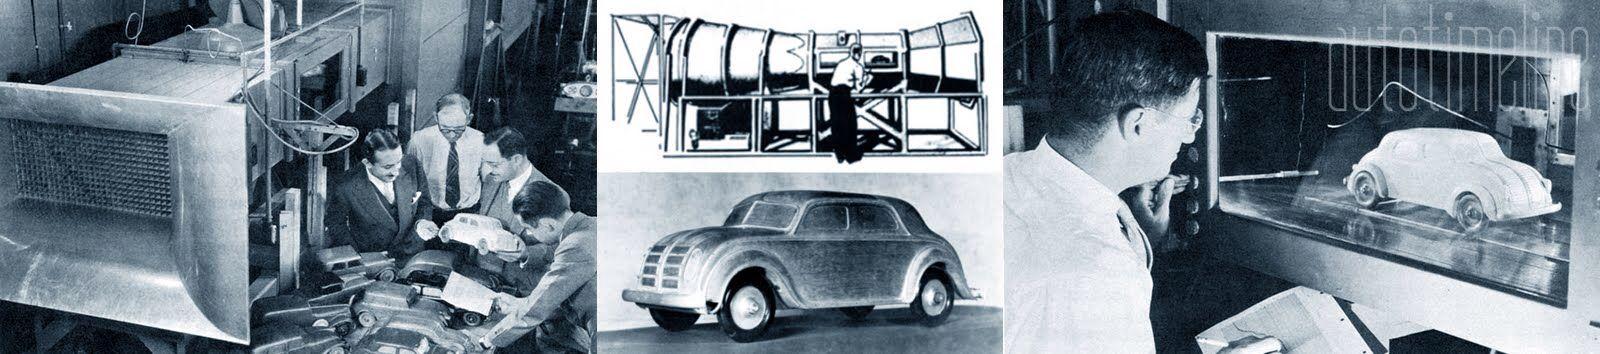 Chrysler Airflow wind tunnel testing.